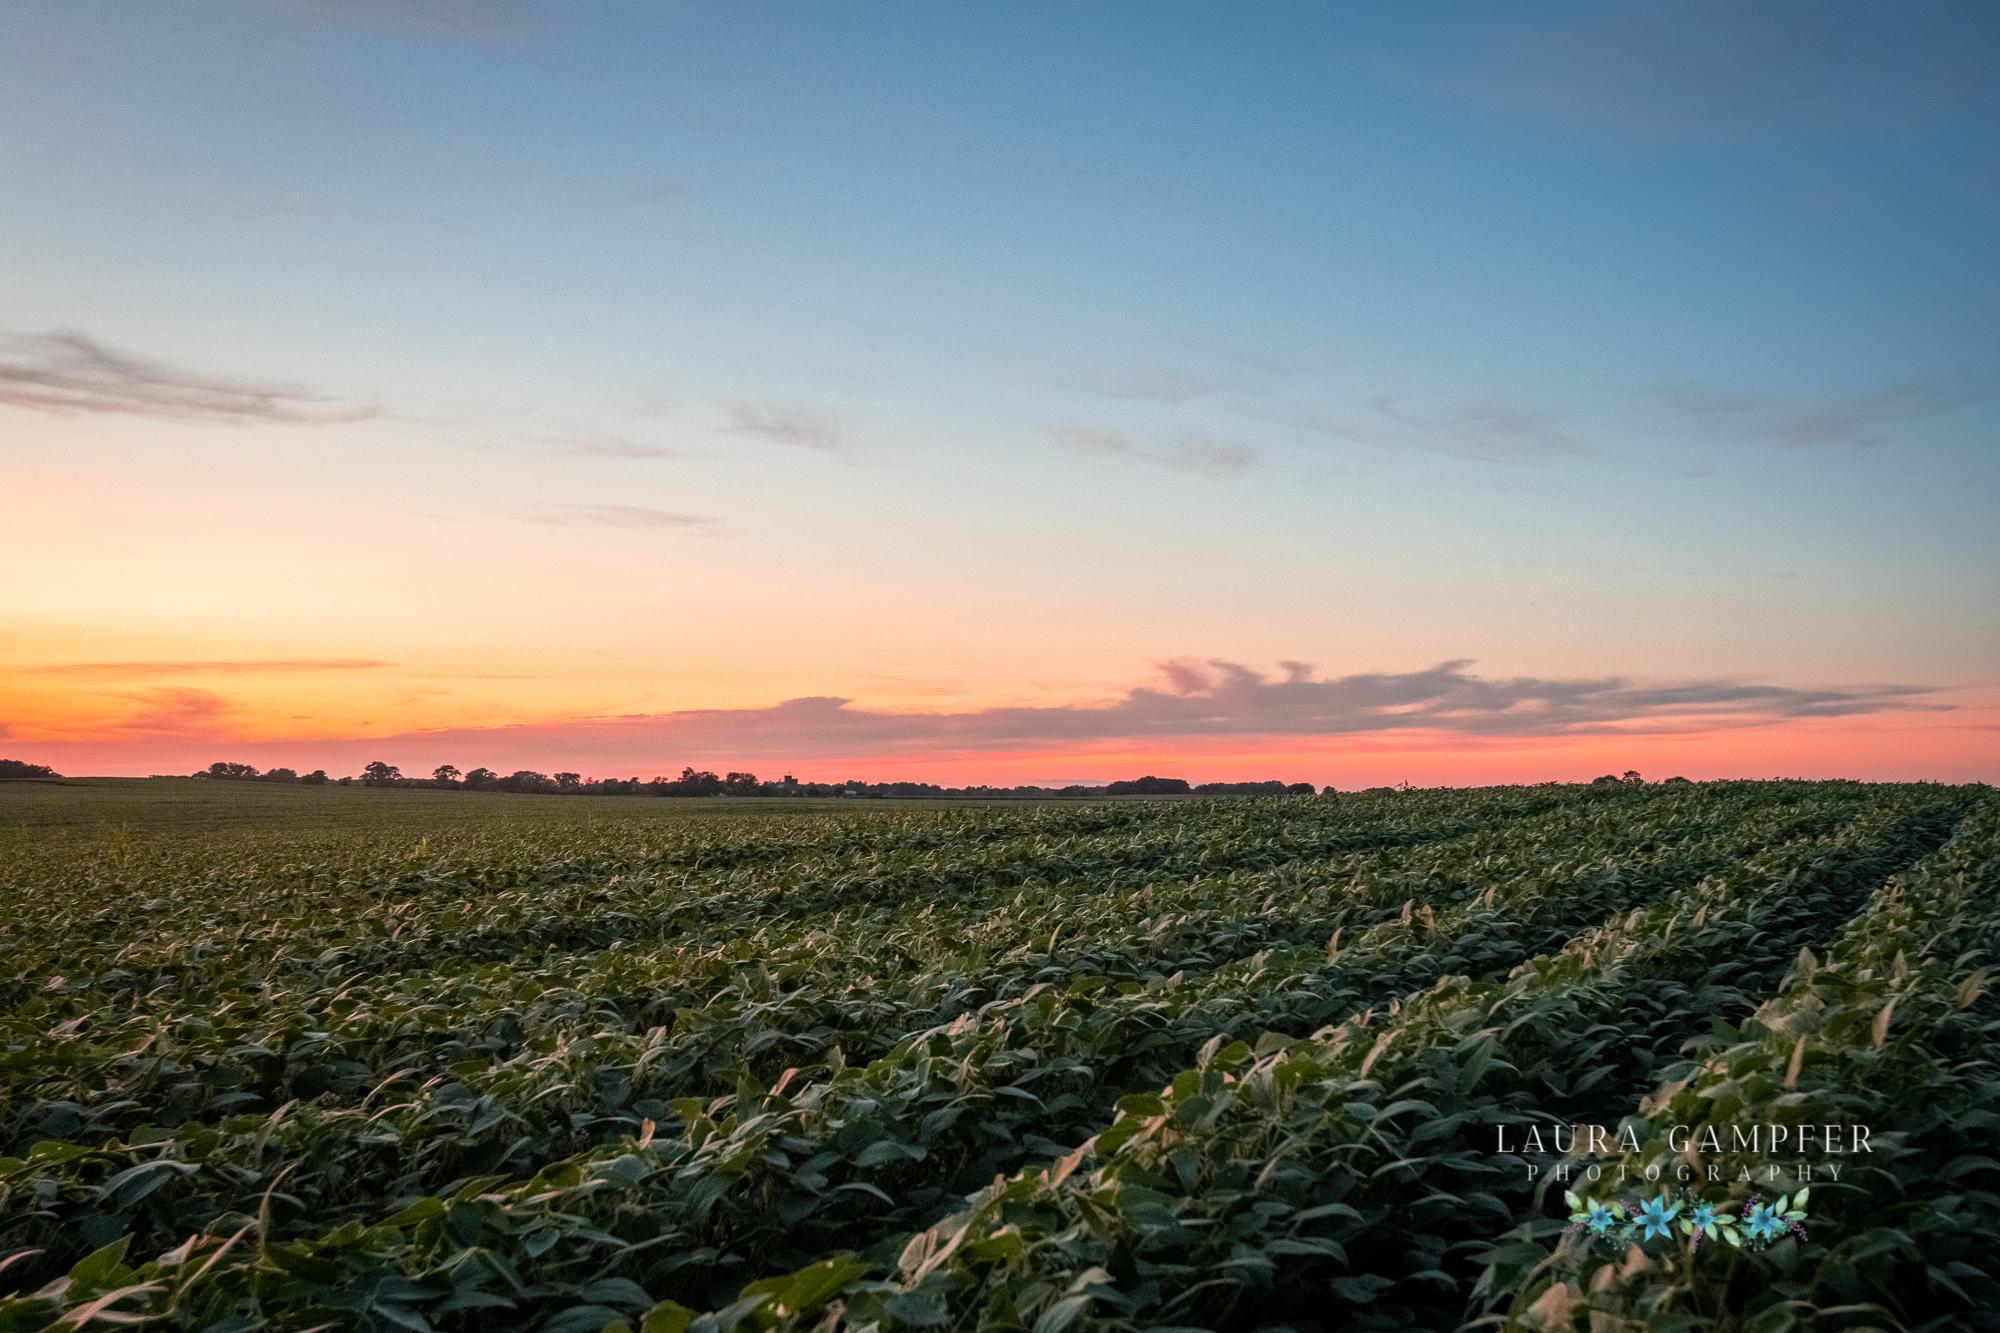 Illinois midwest farm photography